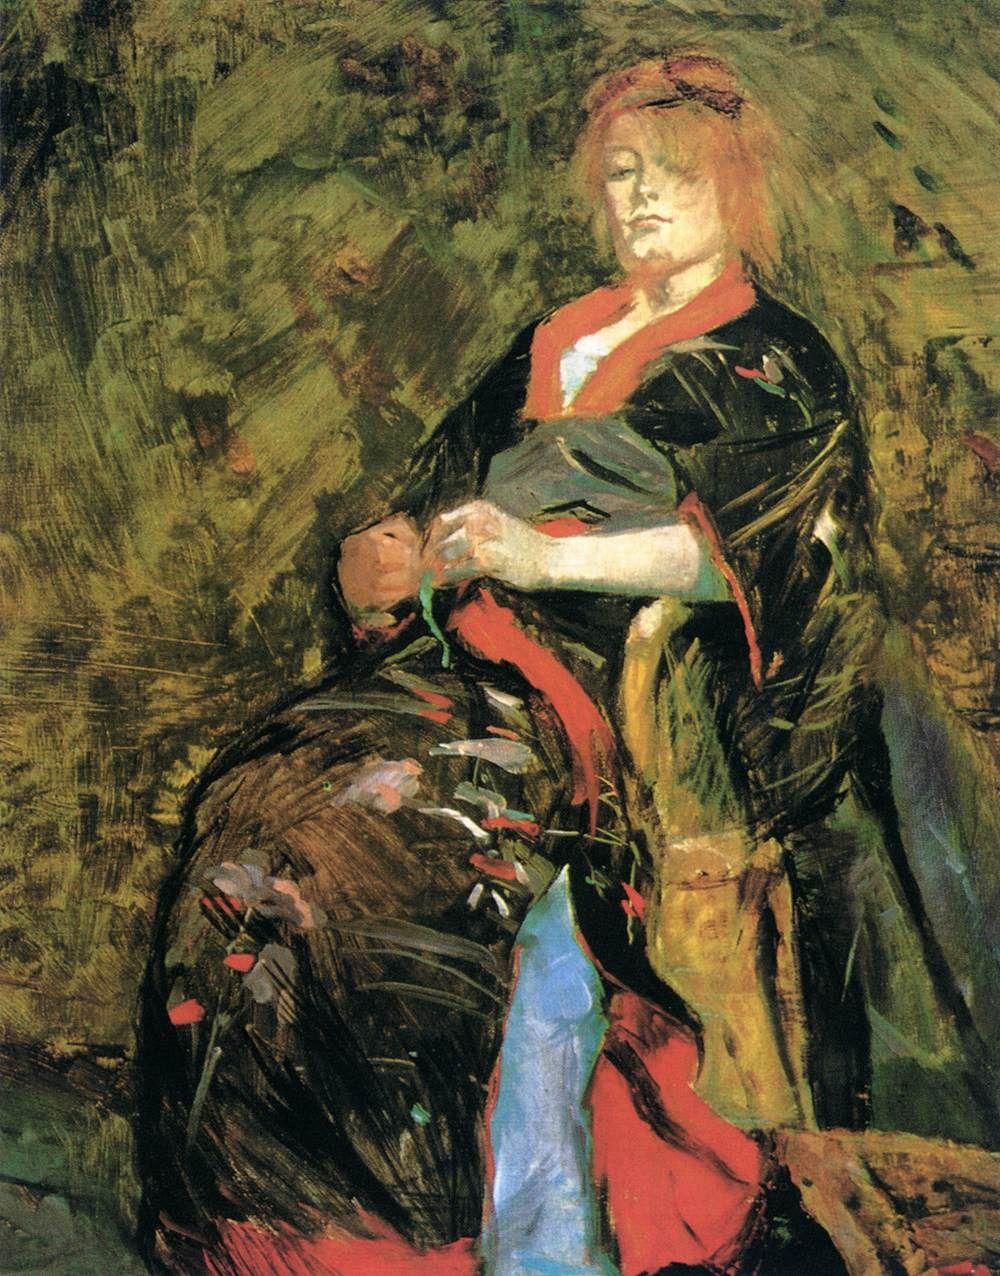 Henri de Toulouse-Lautrec (French, 1864-1901), Lily Grenier, 1888. Oil on canvas, 56 x 47 cm. Museum of Modern Art, New York